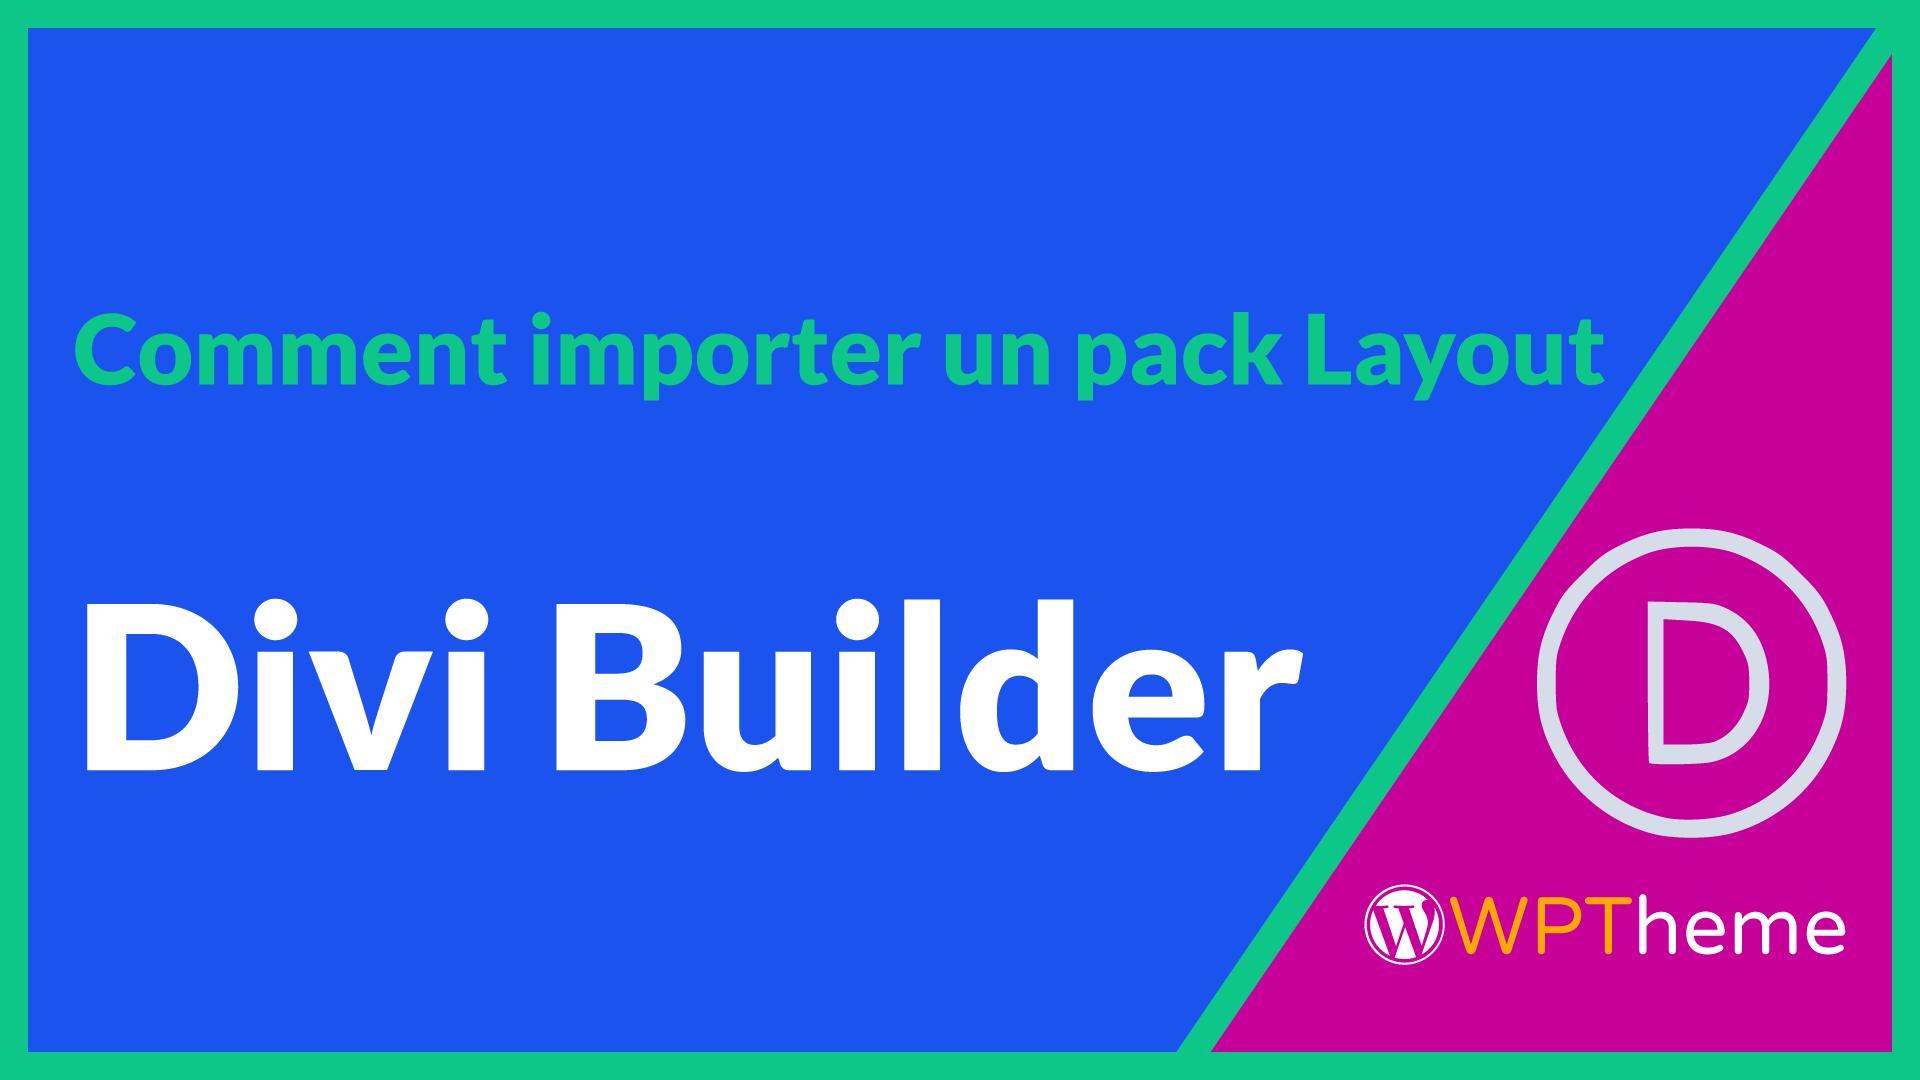 import-pack-layout-divi-builder